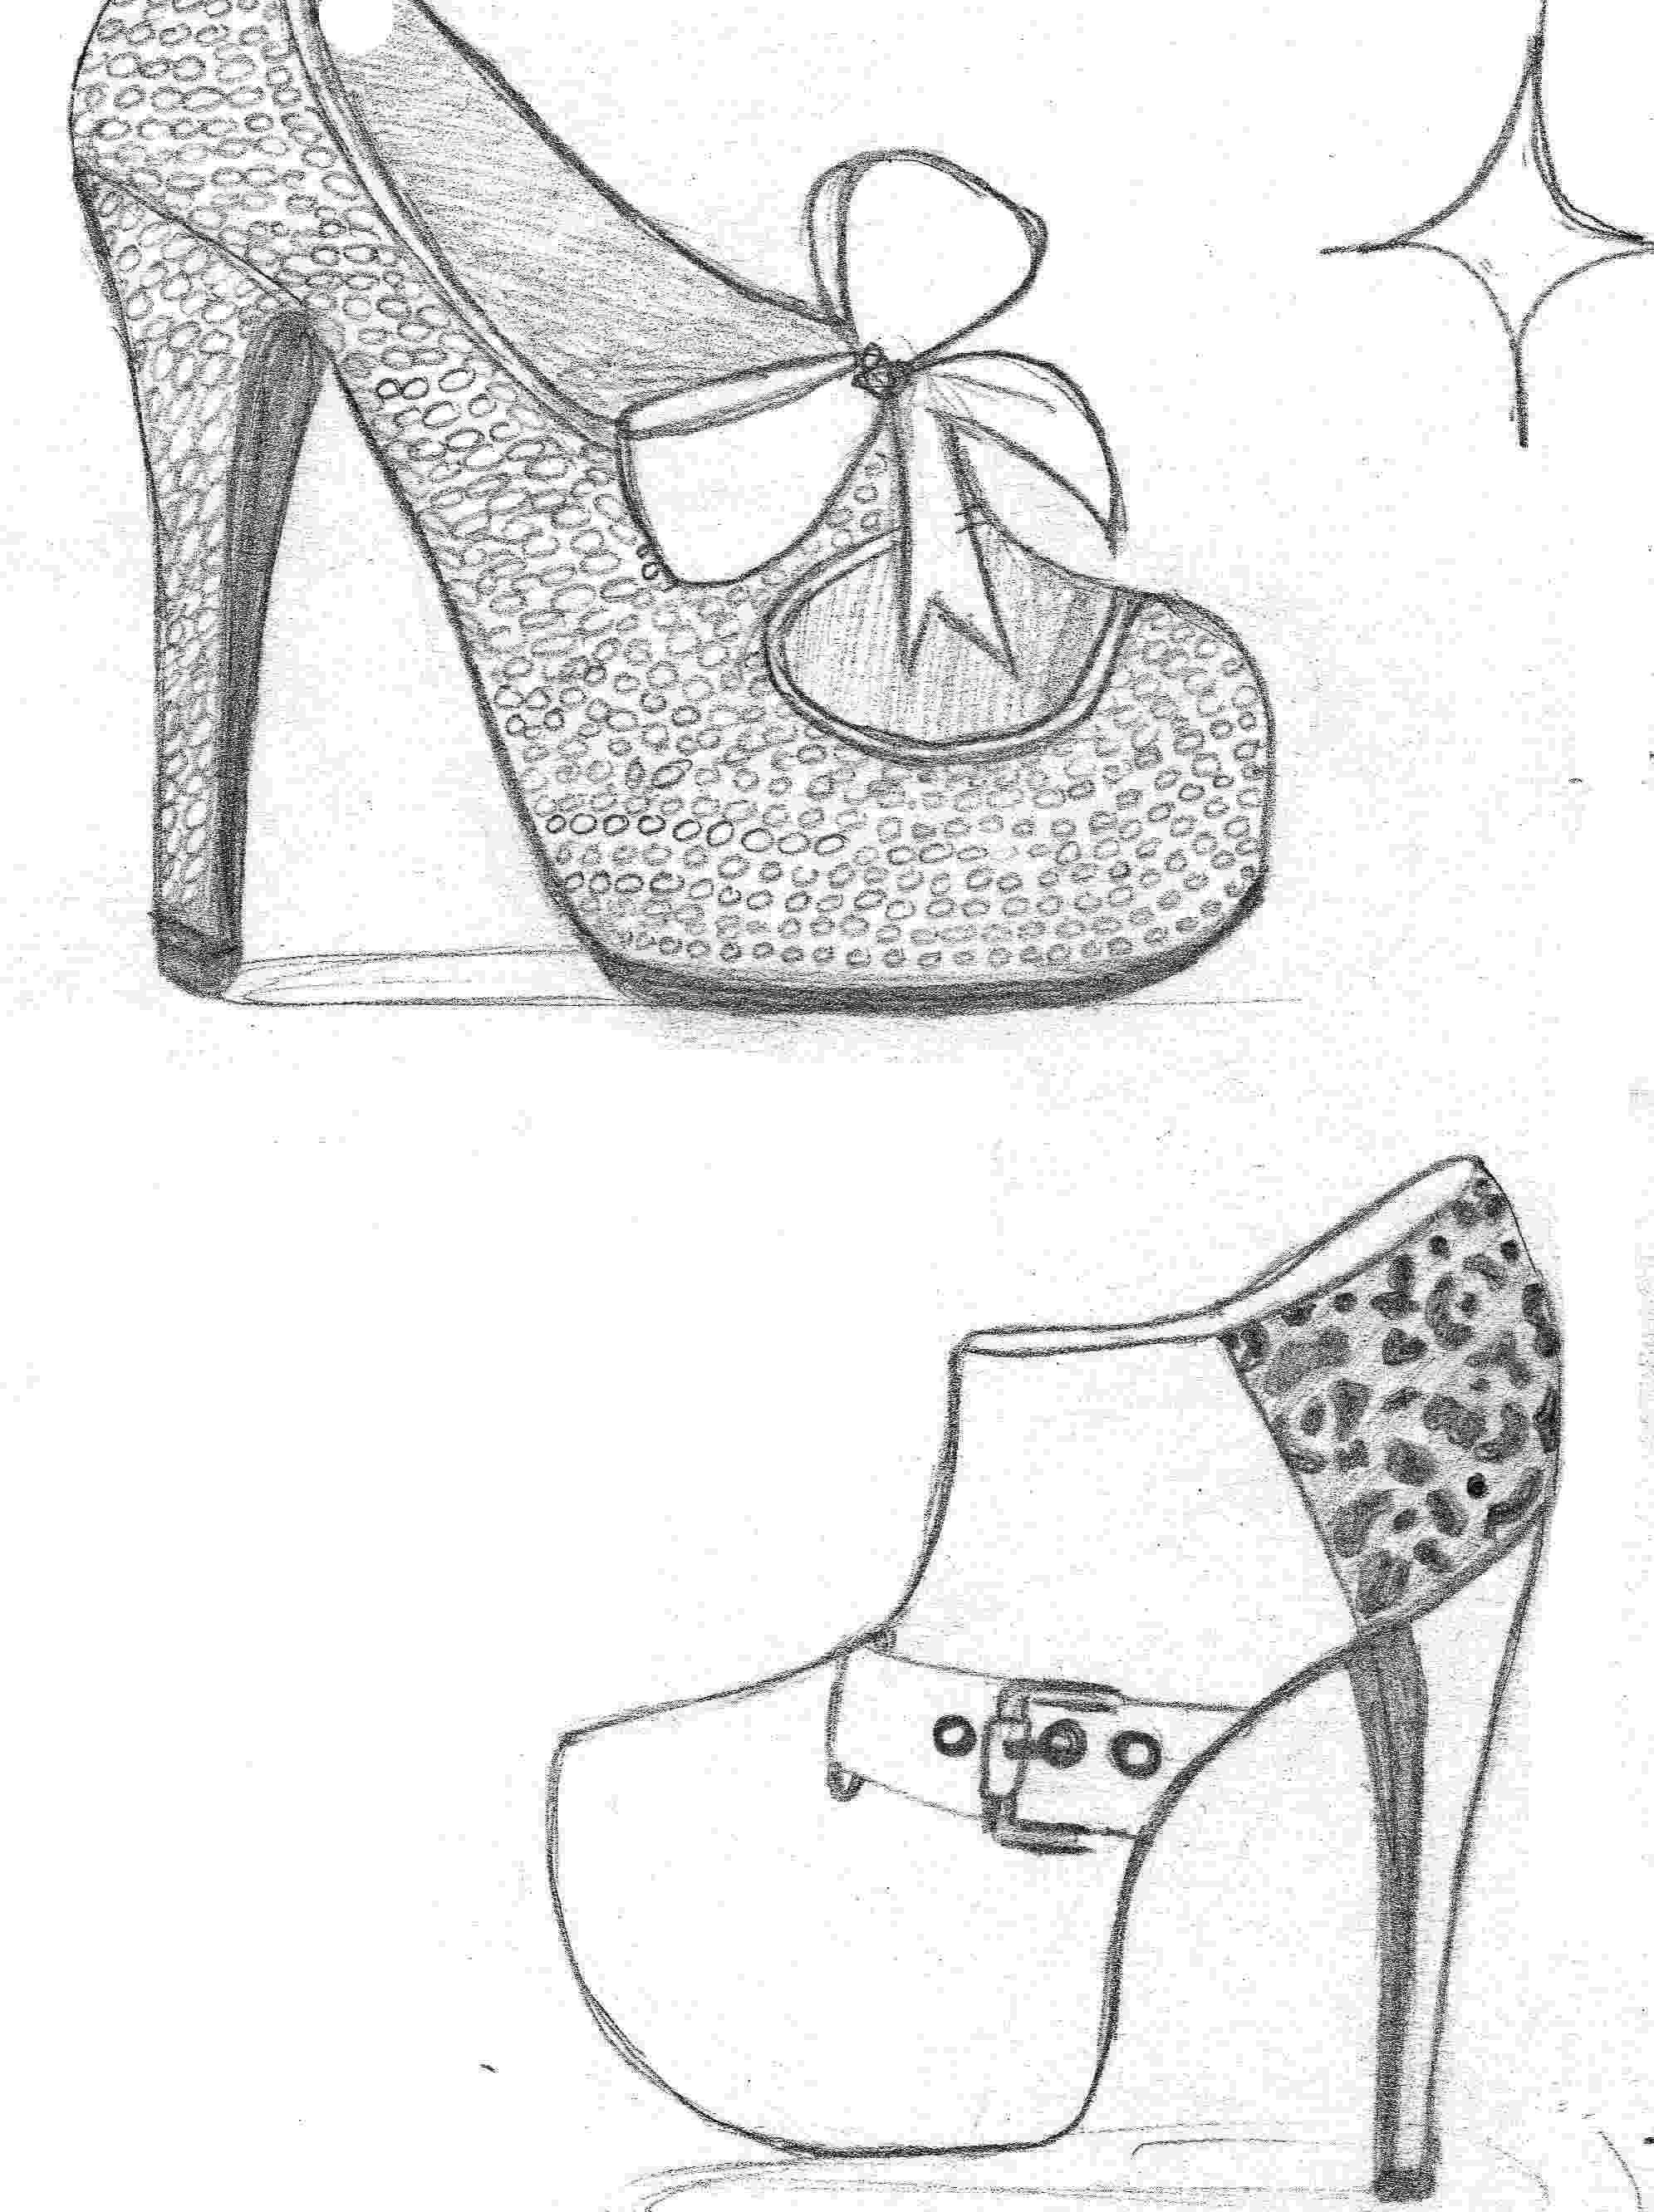 heels sketch october 2012 motion graphics page 2 sketch heels